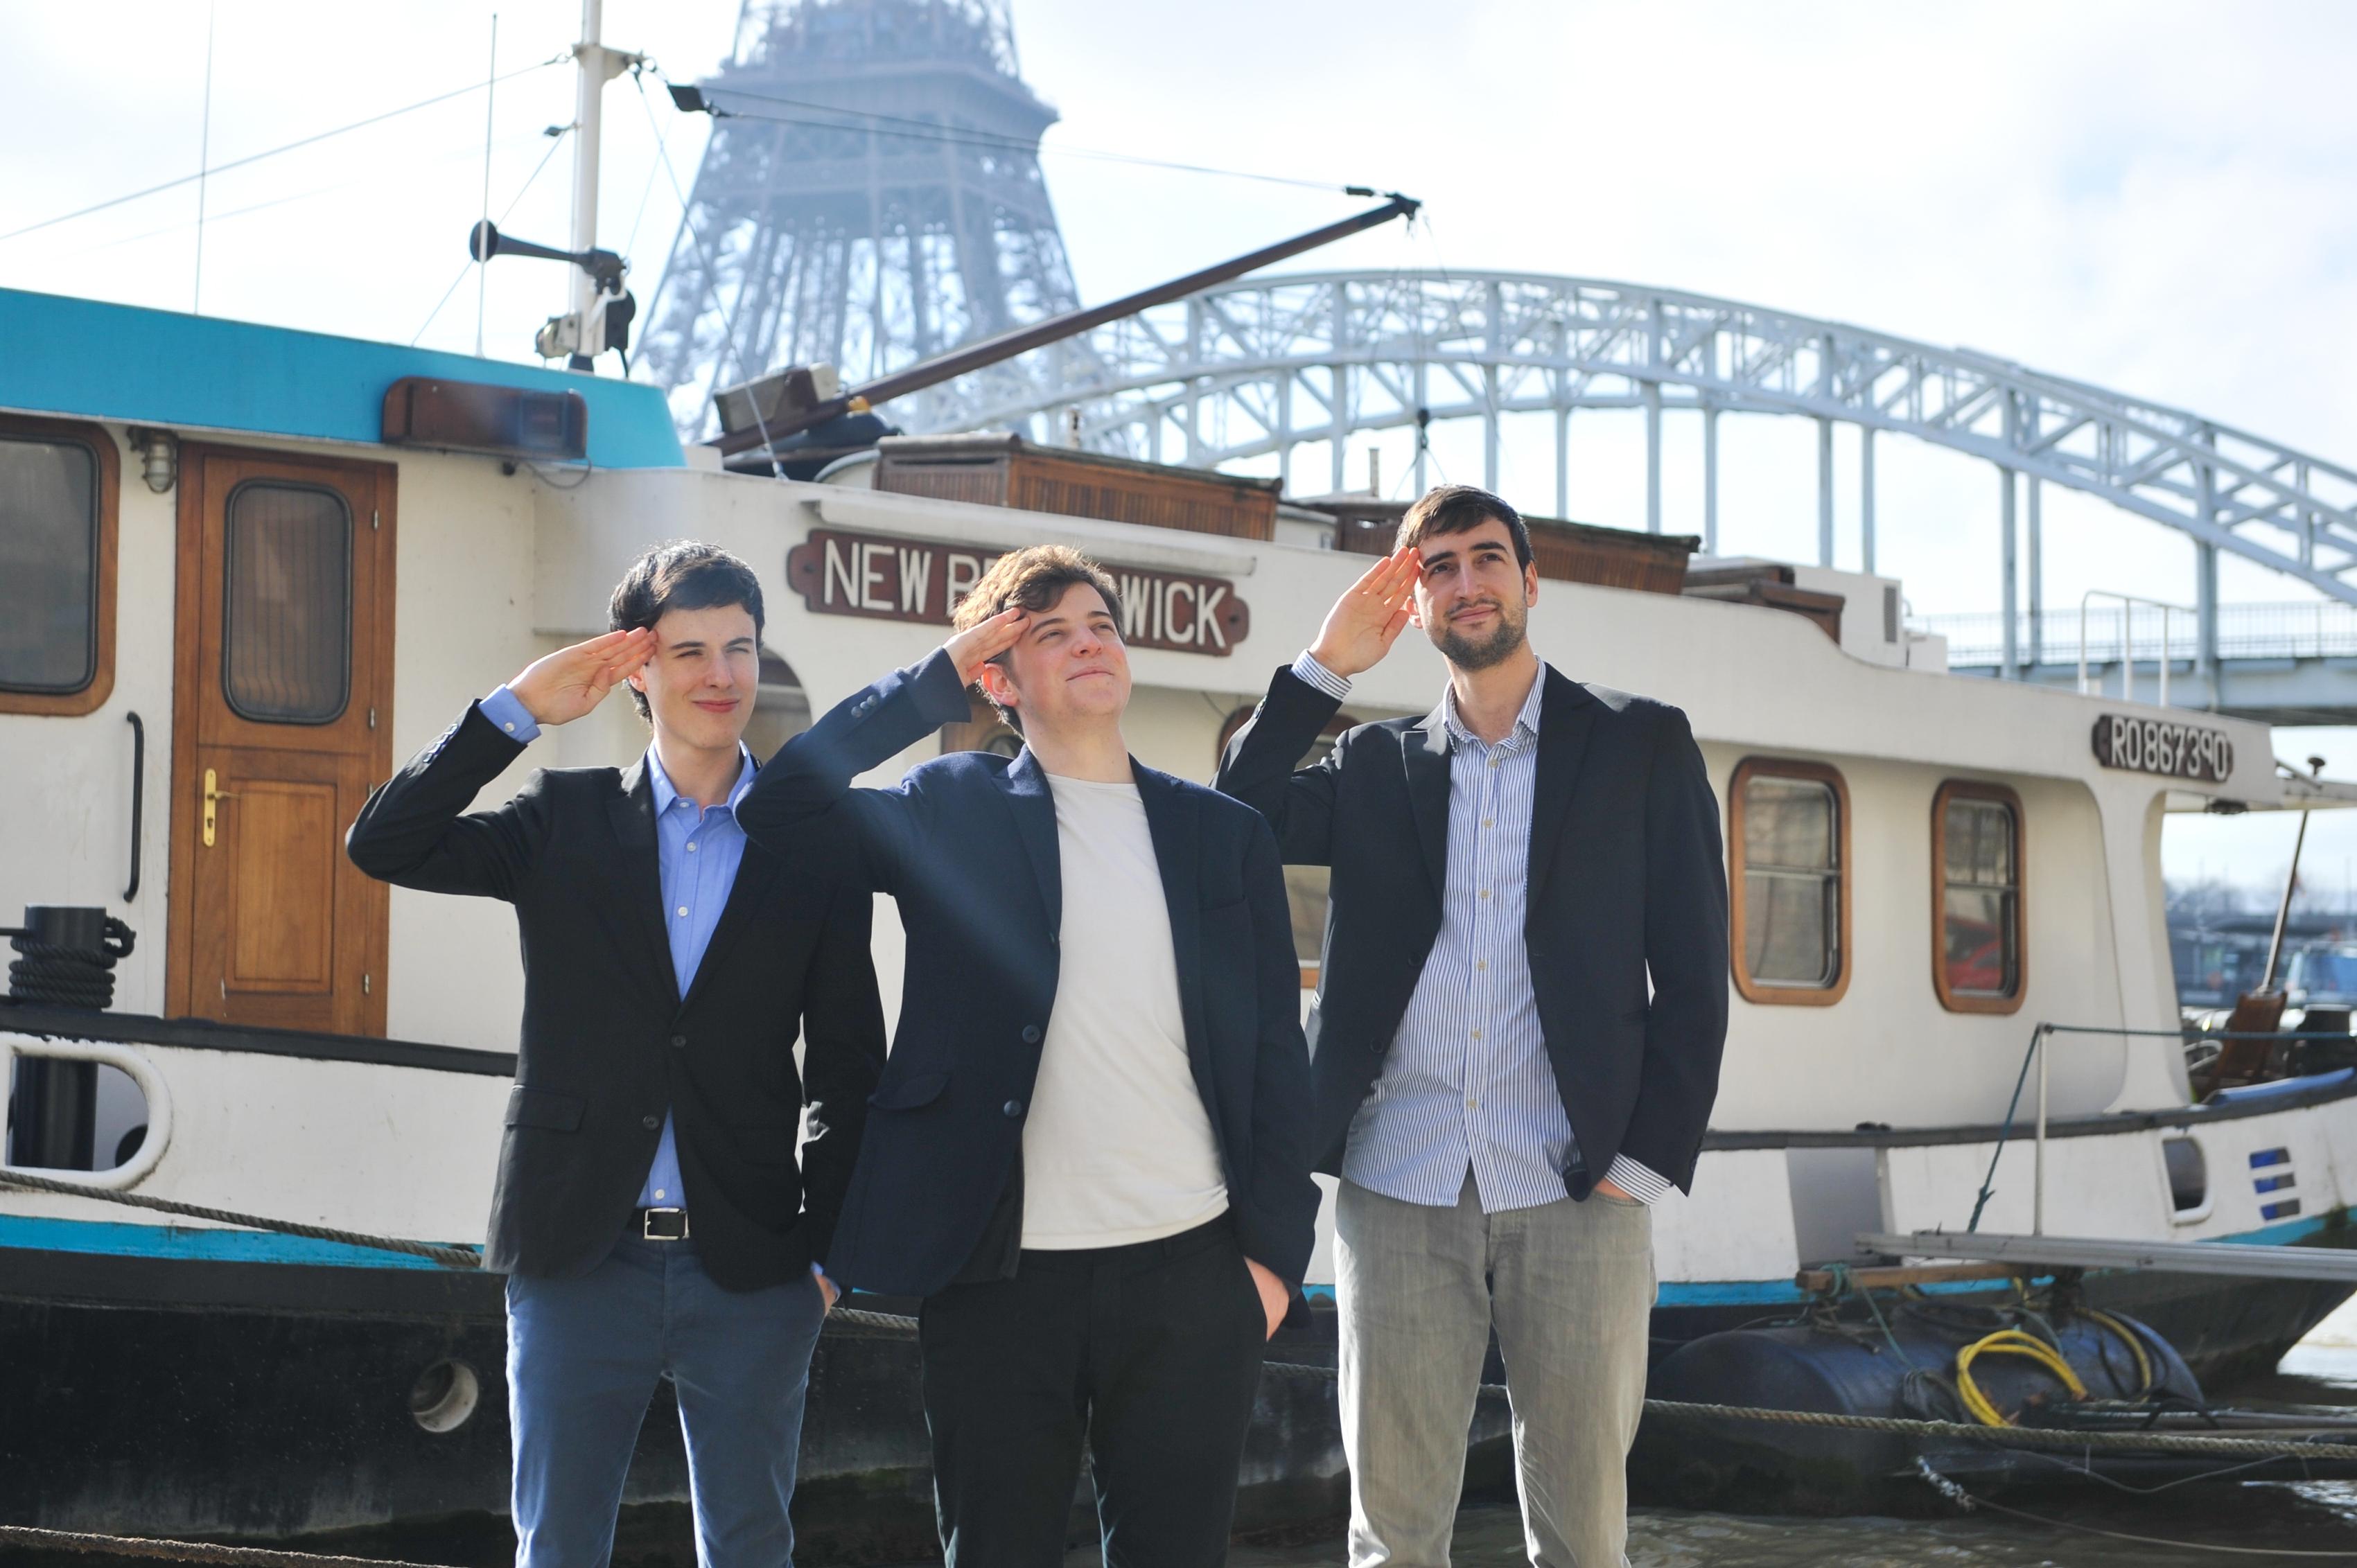 Merci Capitaine x Essec Ventures x Les Chics Types photographe professionnel-6